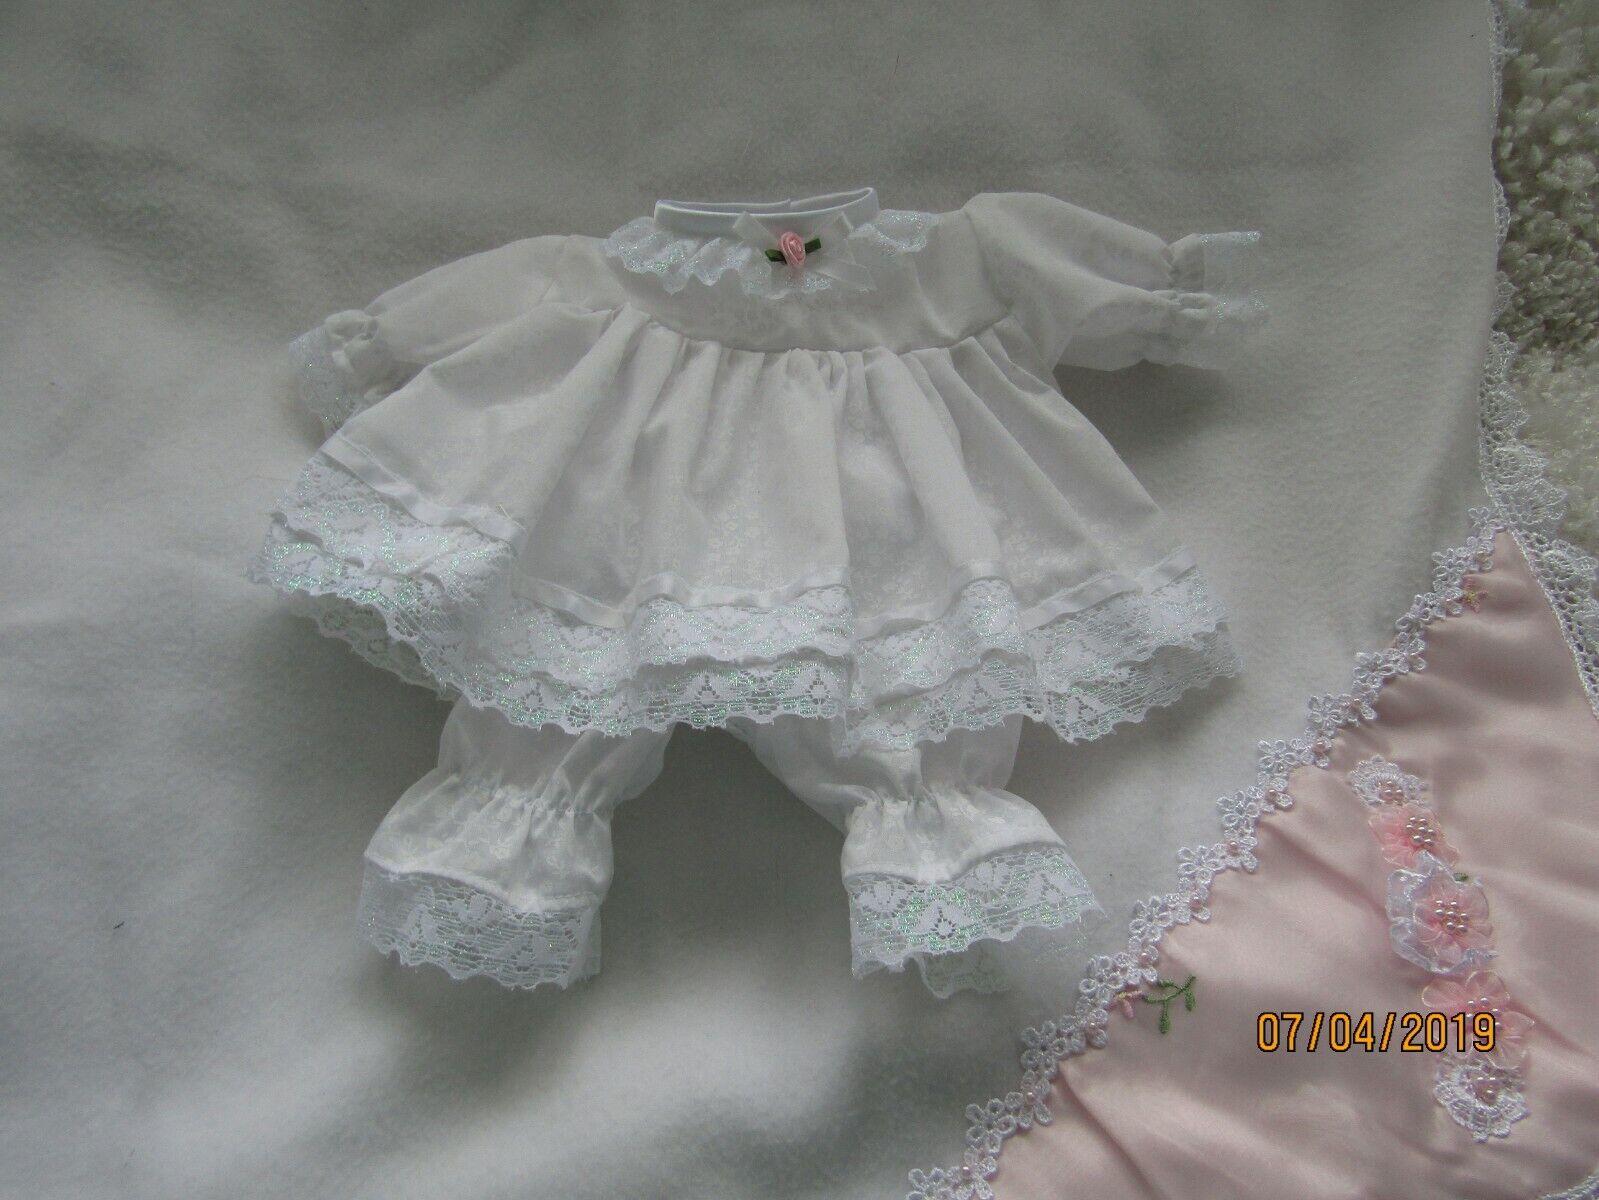 Handmade Prem baby Two piece Dress set Size 3-7 Lbs White Fluer polycotton